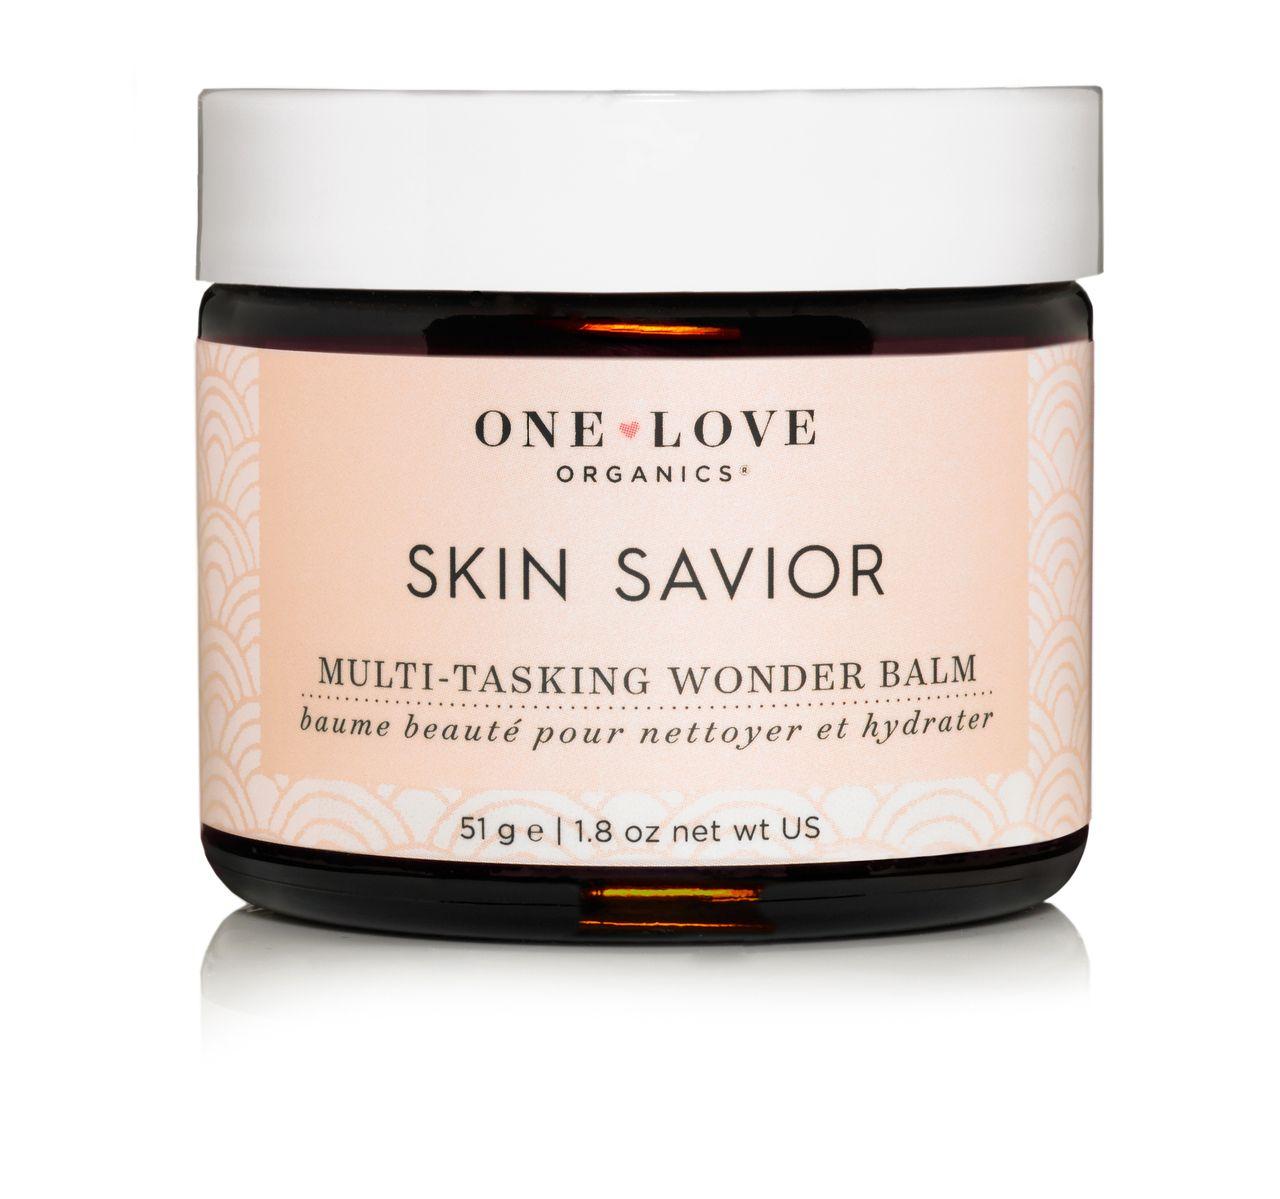 Epic Beauty Bar - One Love Organics Skin Savior Multi-Tasking Wonder Balm, $49.00 (http://www.epicbeautybar.com/one-love-organics-skin-savior-multi-tasking-wonder-balm/)  #beauty #skincare #makeup